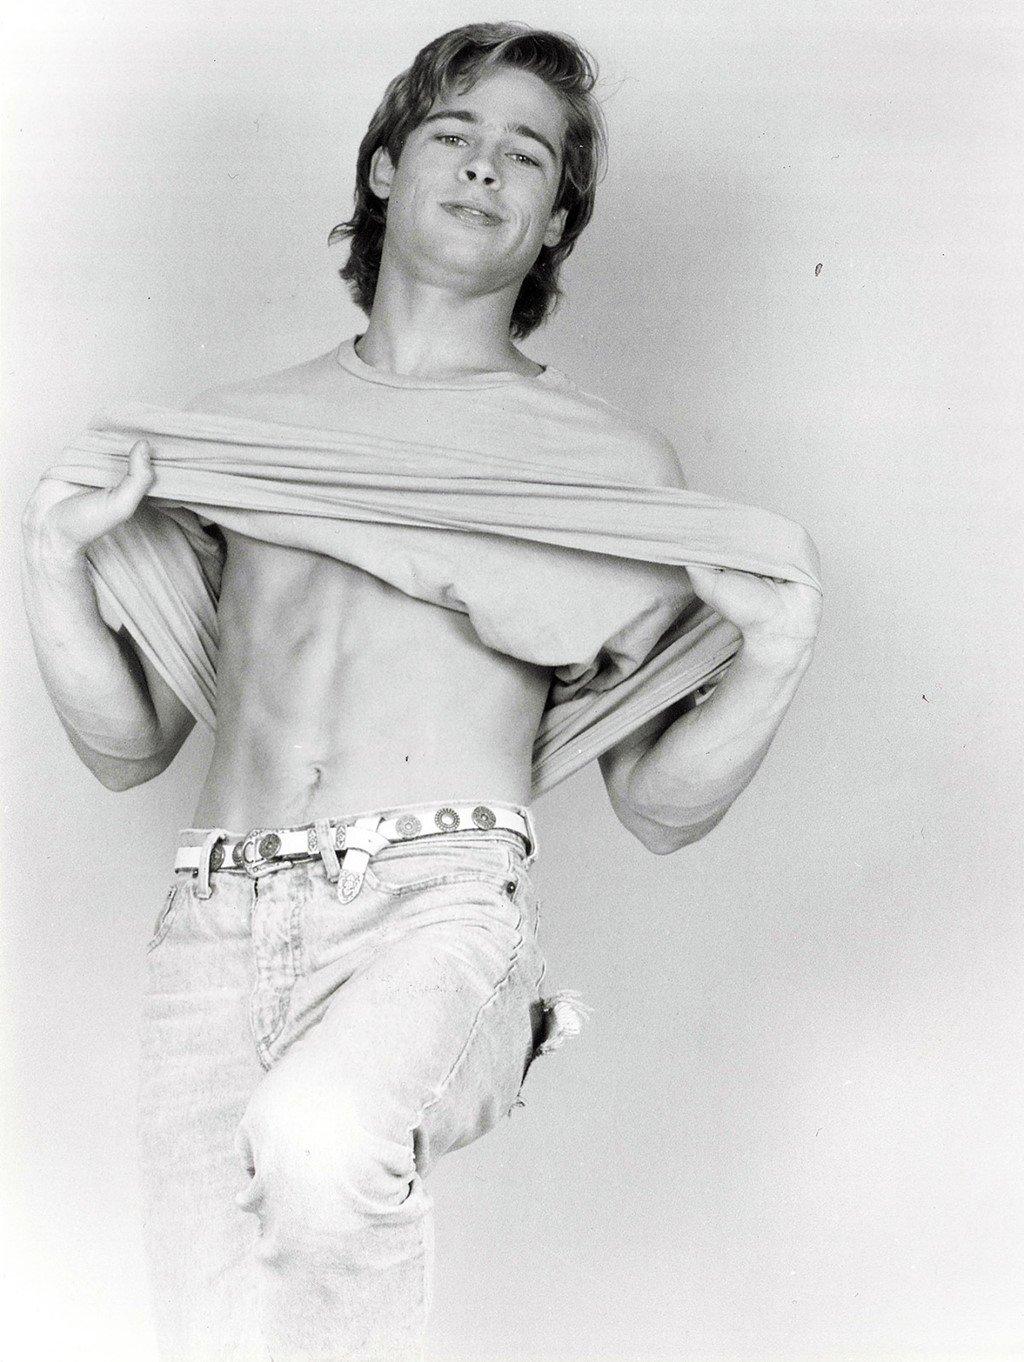 Ve dien trai cua Brad Pitt thoi tre trong bo anh chua tung cong bo hinh anh 10